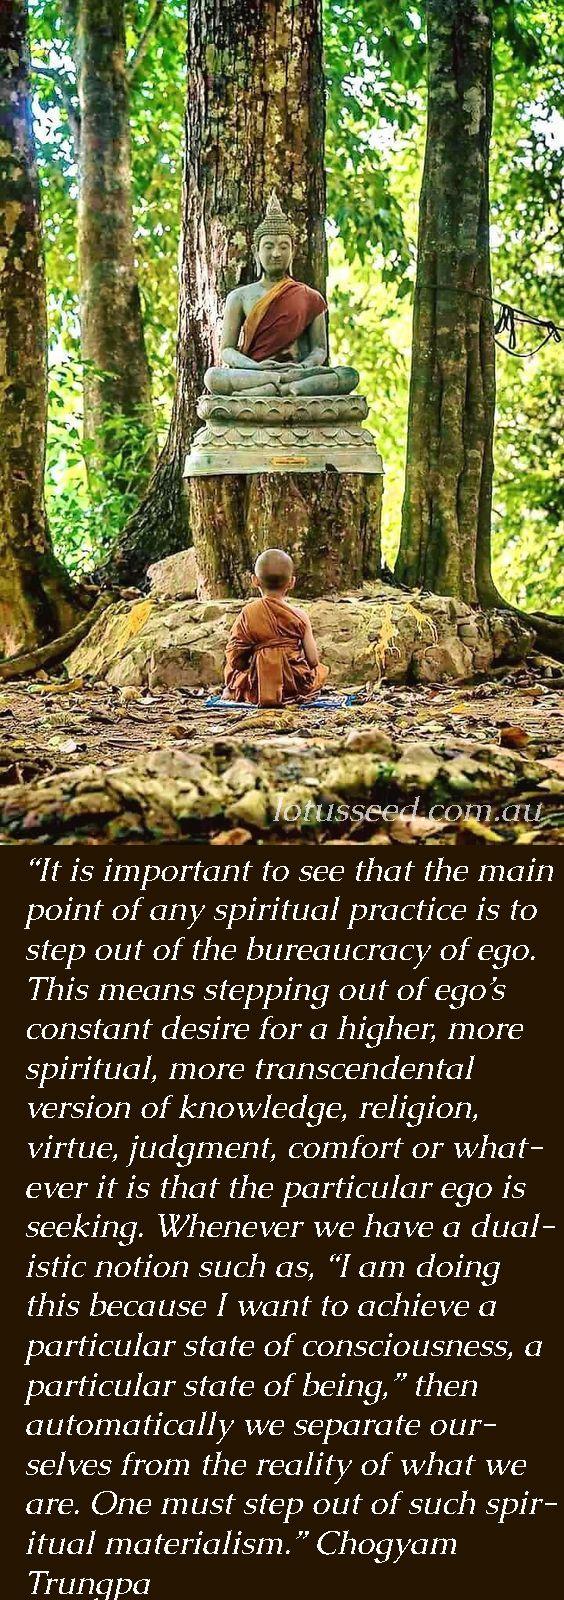 Chogyam Trungpa Buddhism Zen quotes by lotusseed.com.au